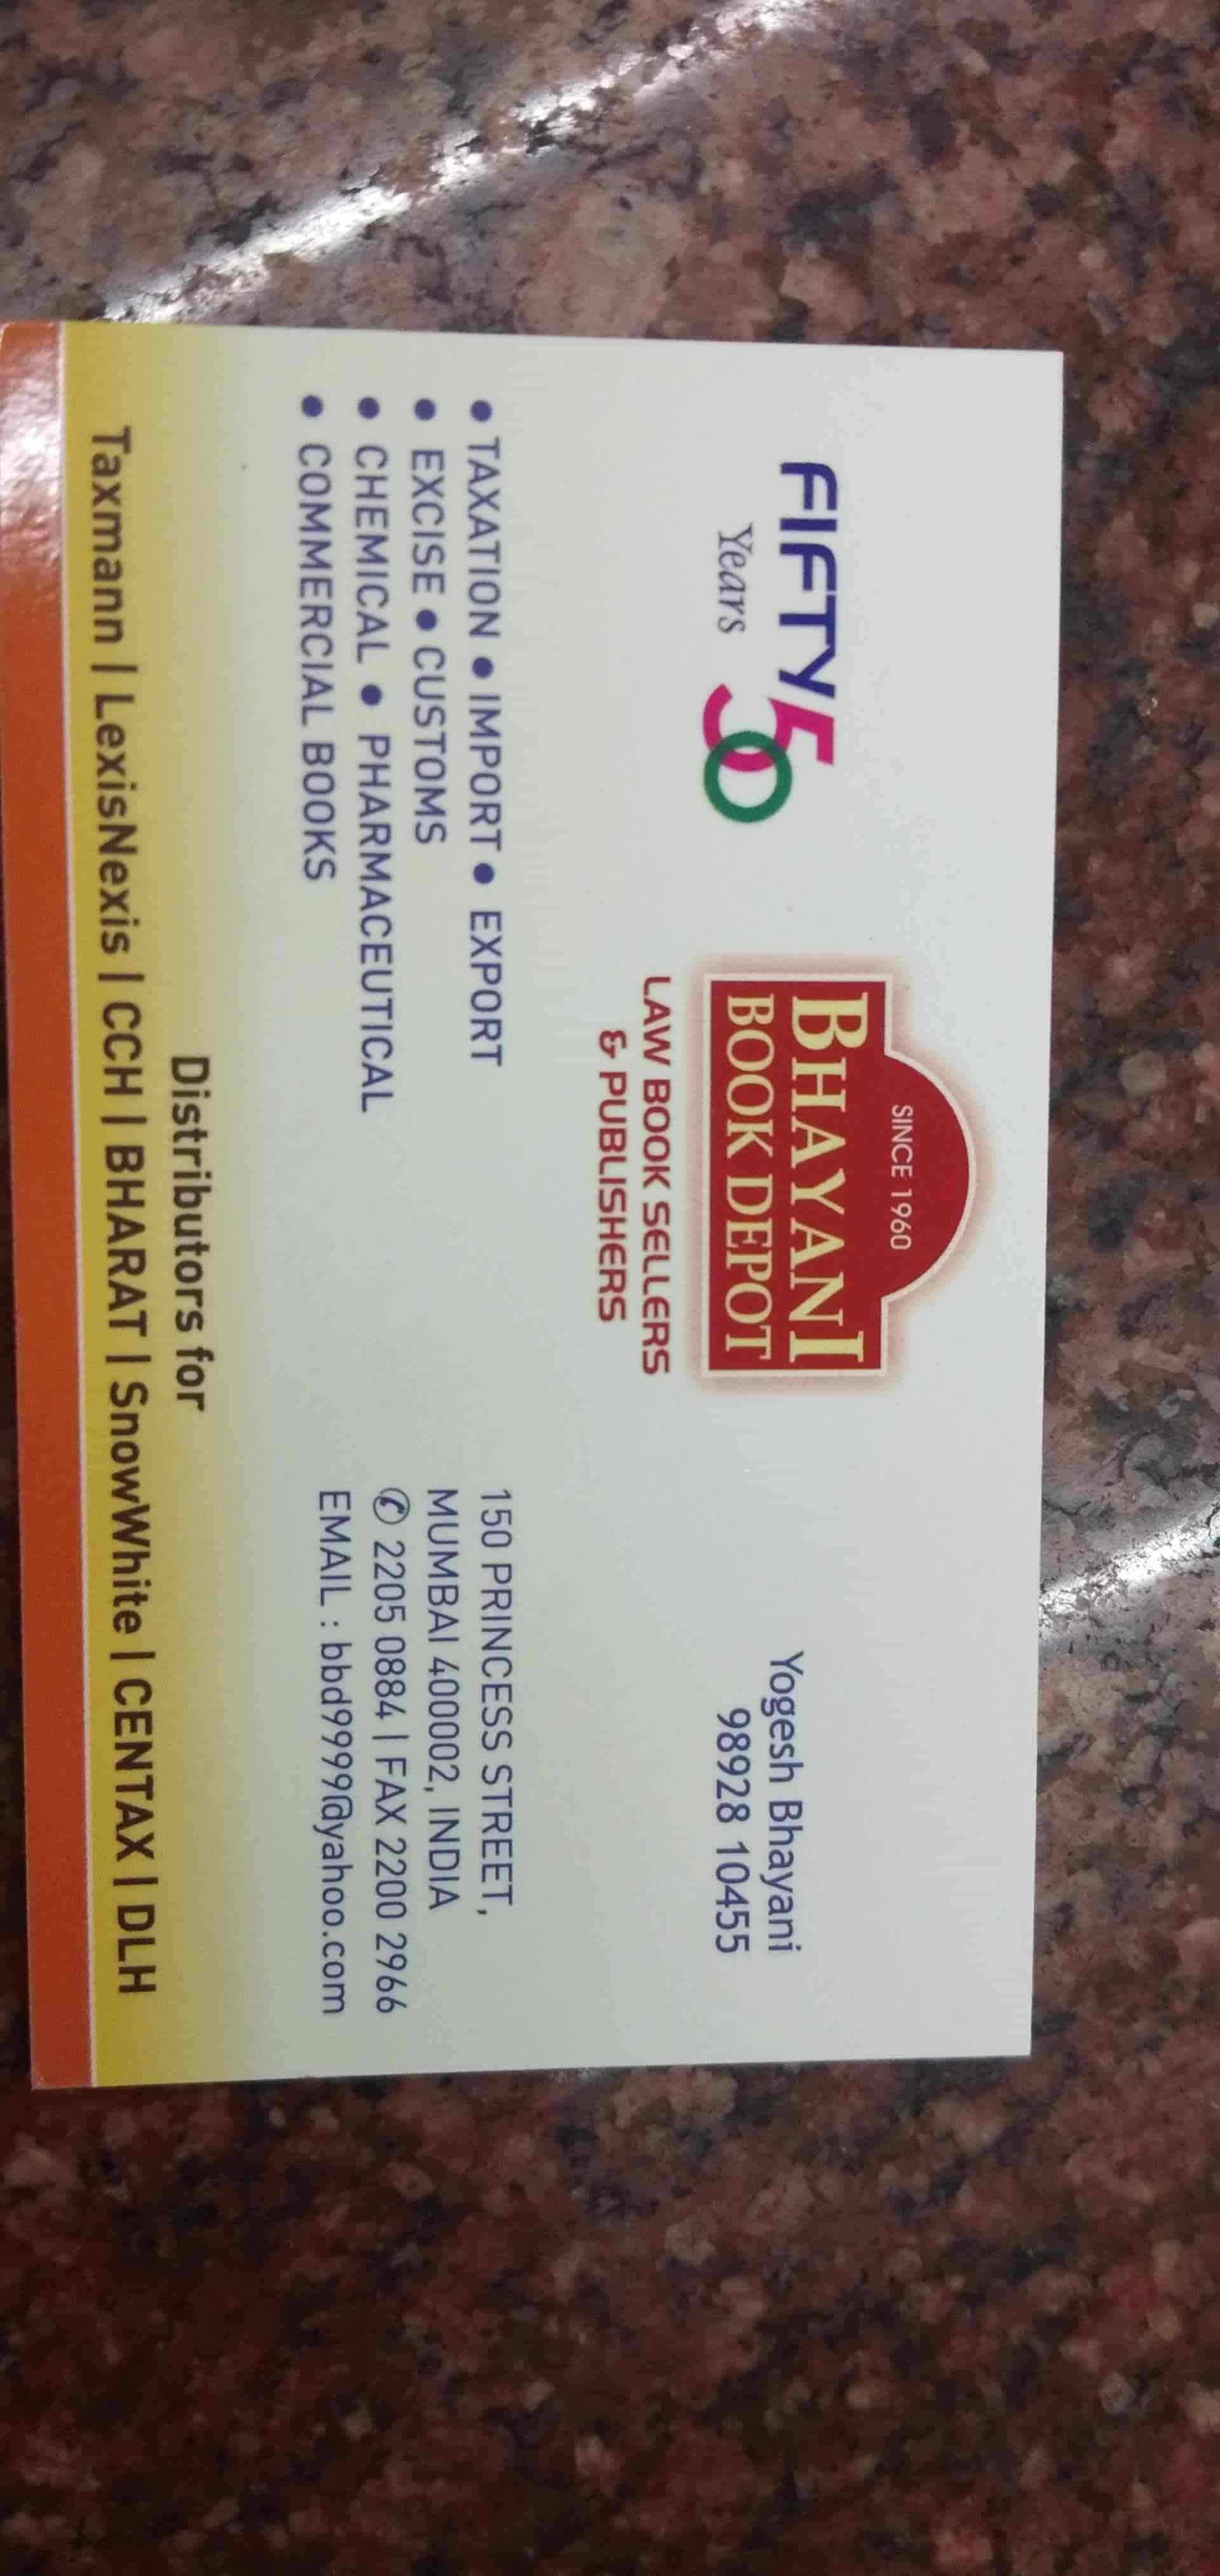 Bhayani Book Depot, Princess Street - Book Shops in Mumbai